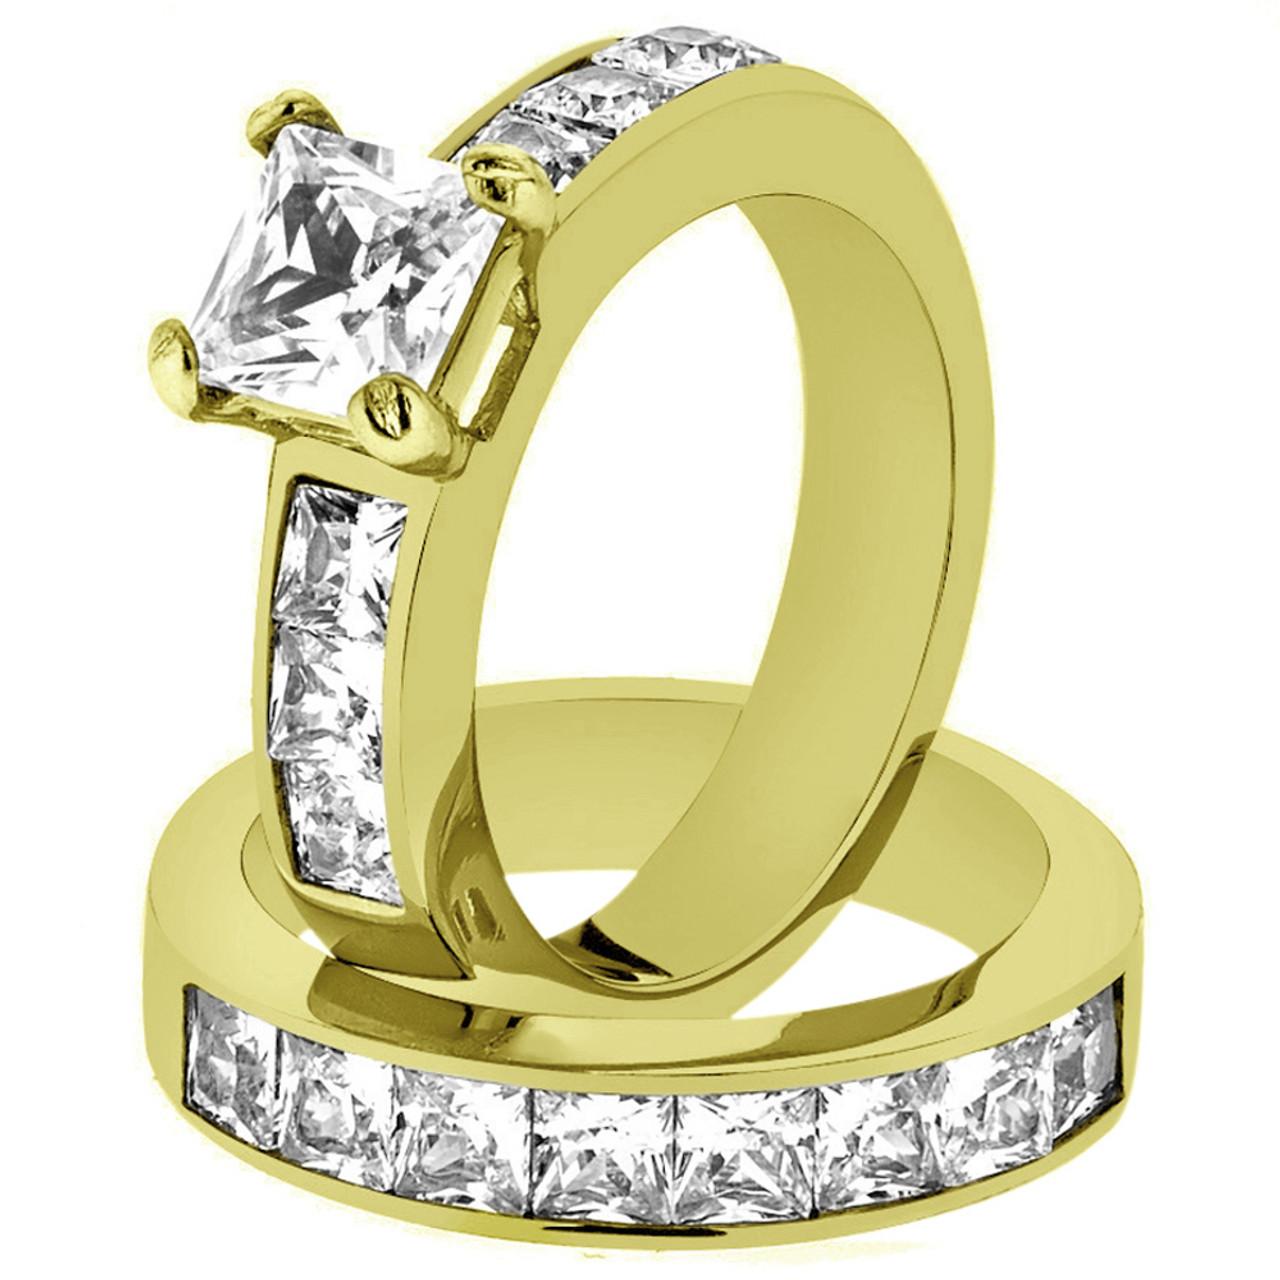 STUNNING PRINCESS CUT CZ 14K GP STAINLESS STEEL WEDDING RING SET WOMEN/'S SZ 5-11